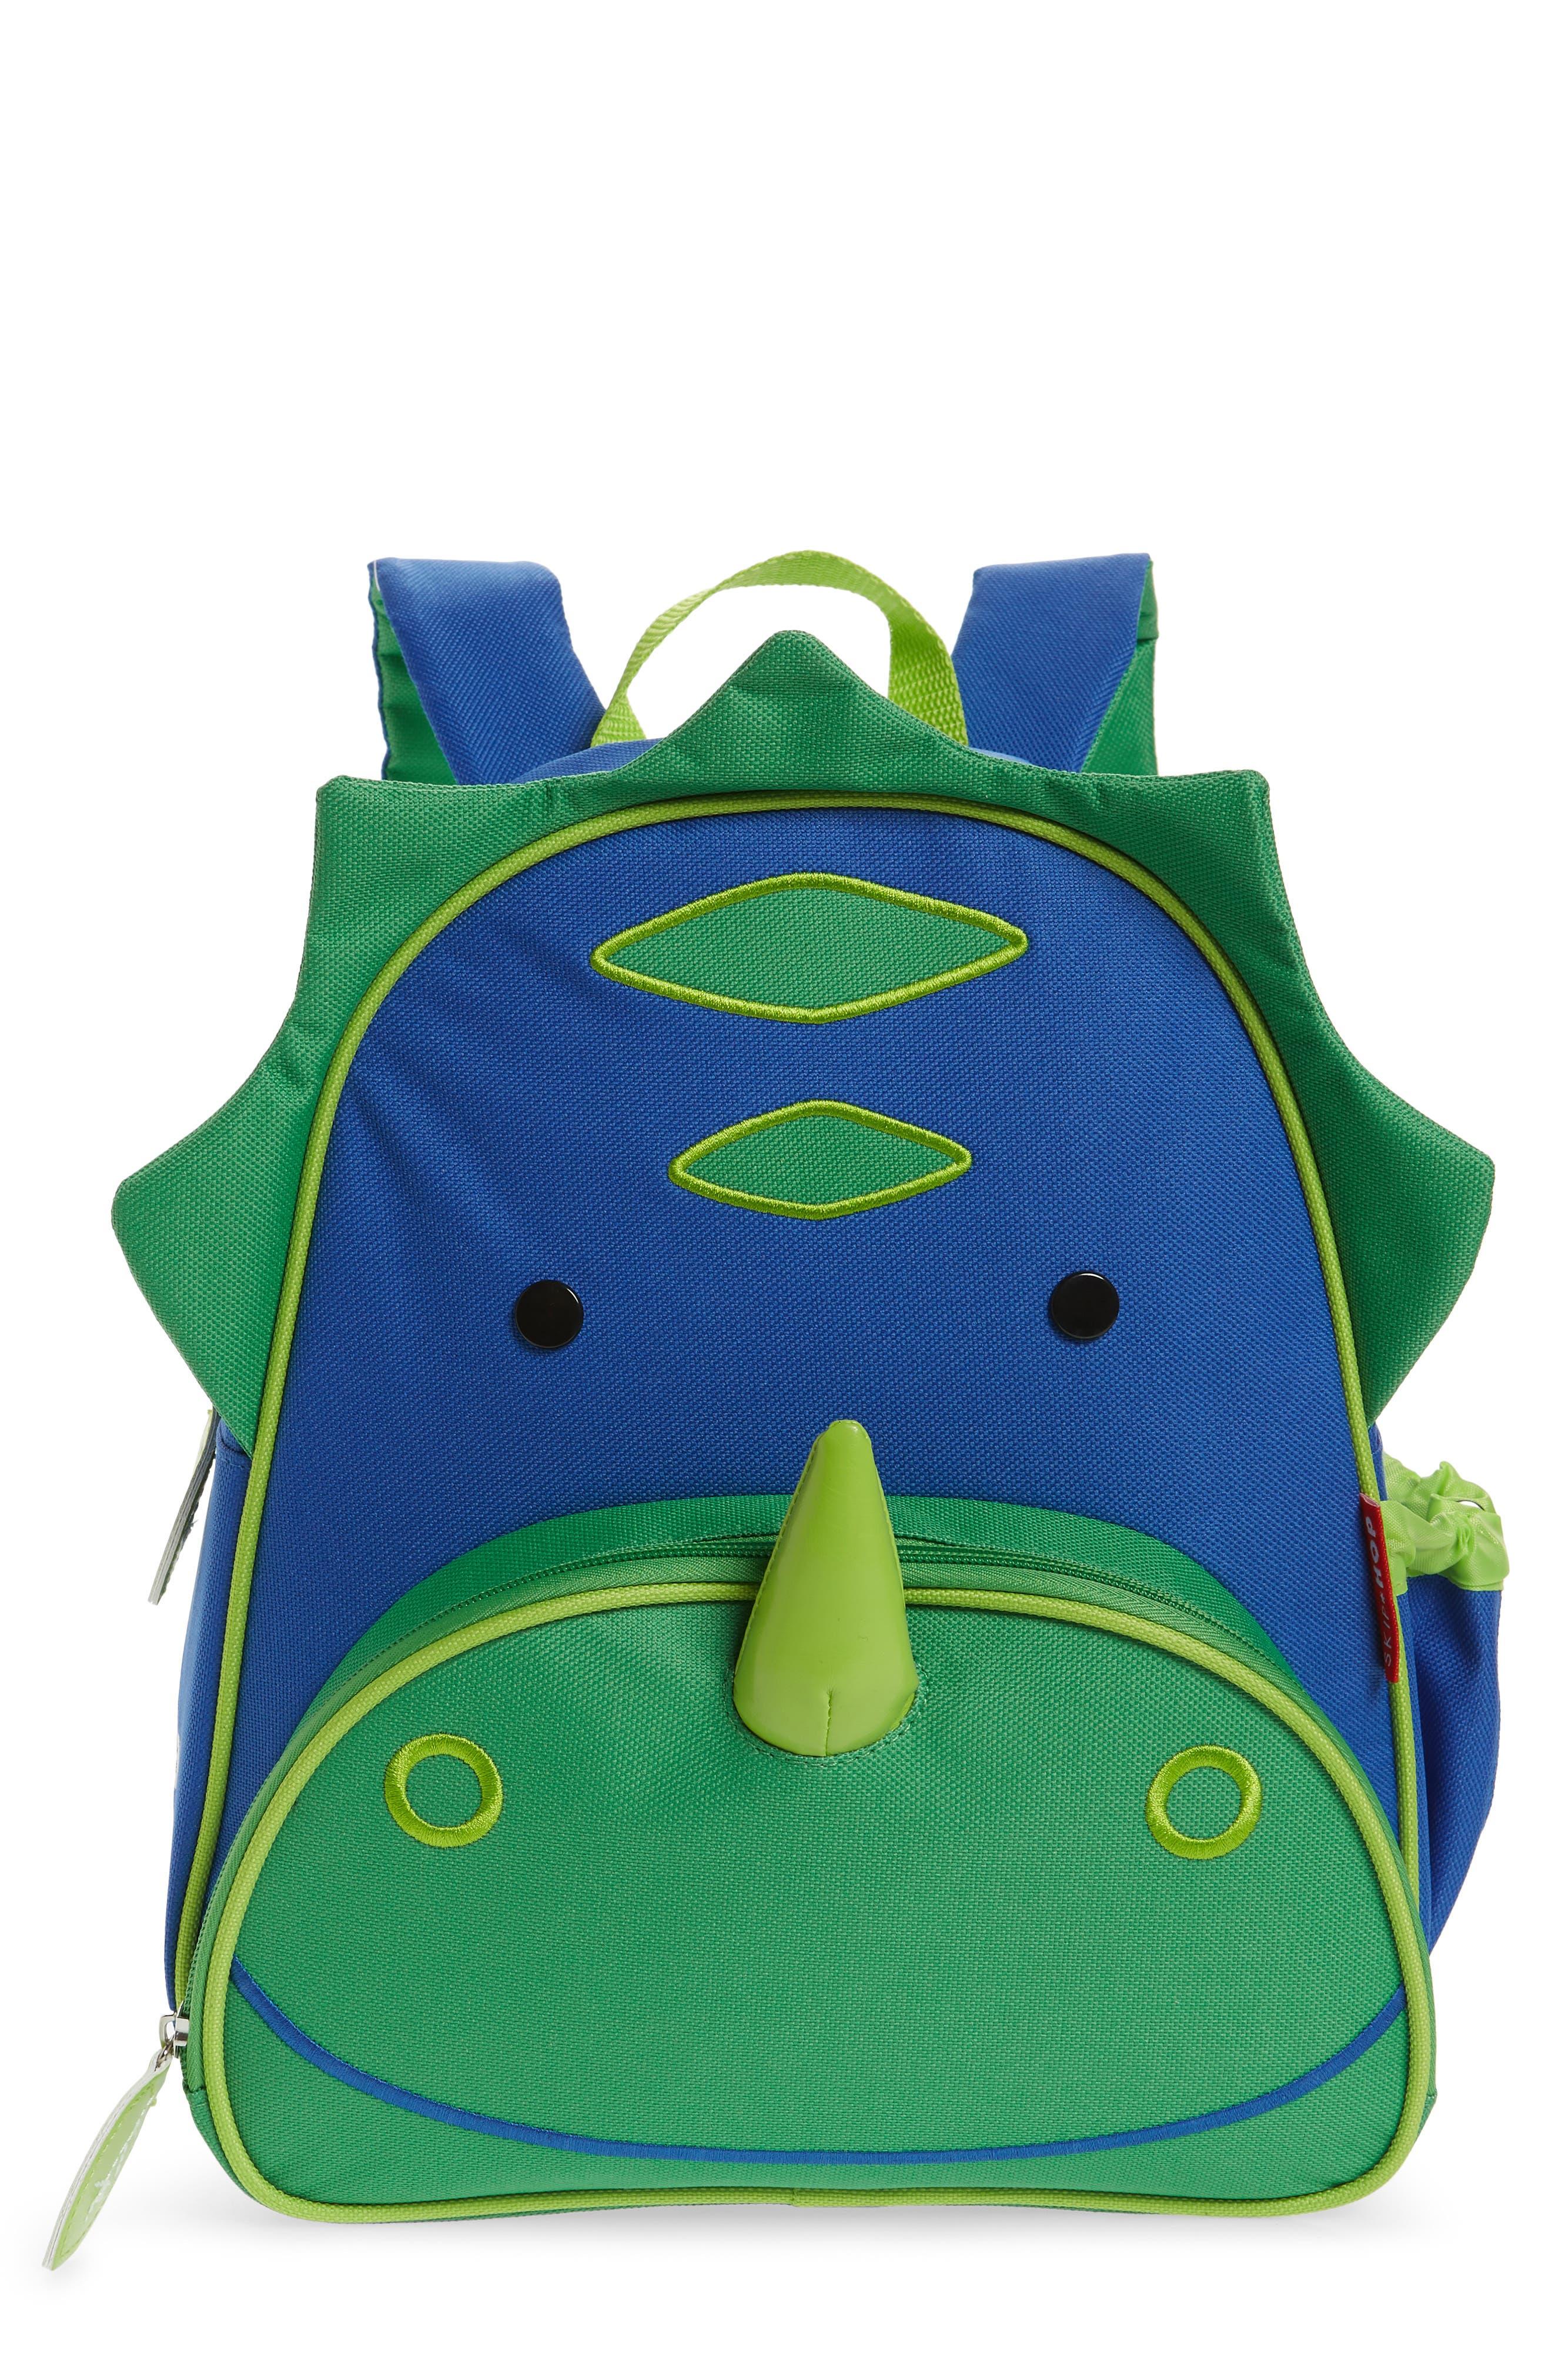 SKIP HOP Zoo Pack Backpack, Main, color, GREEN/ BLUE